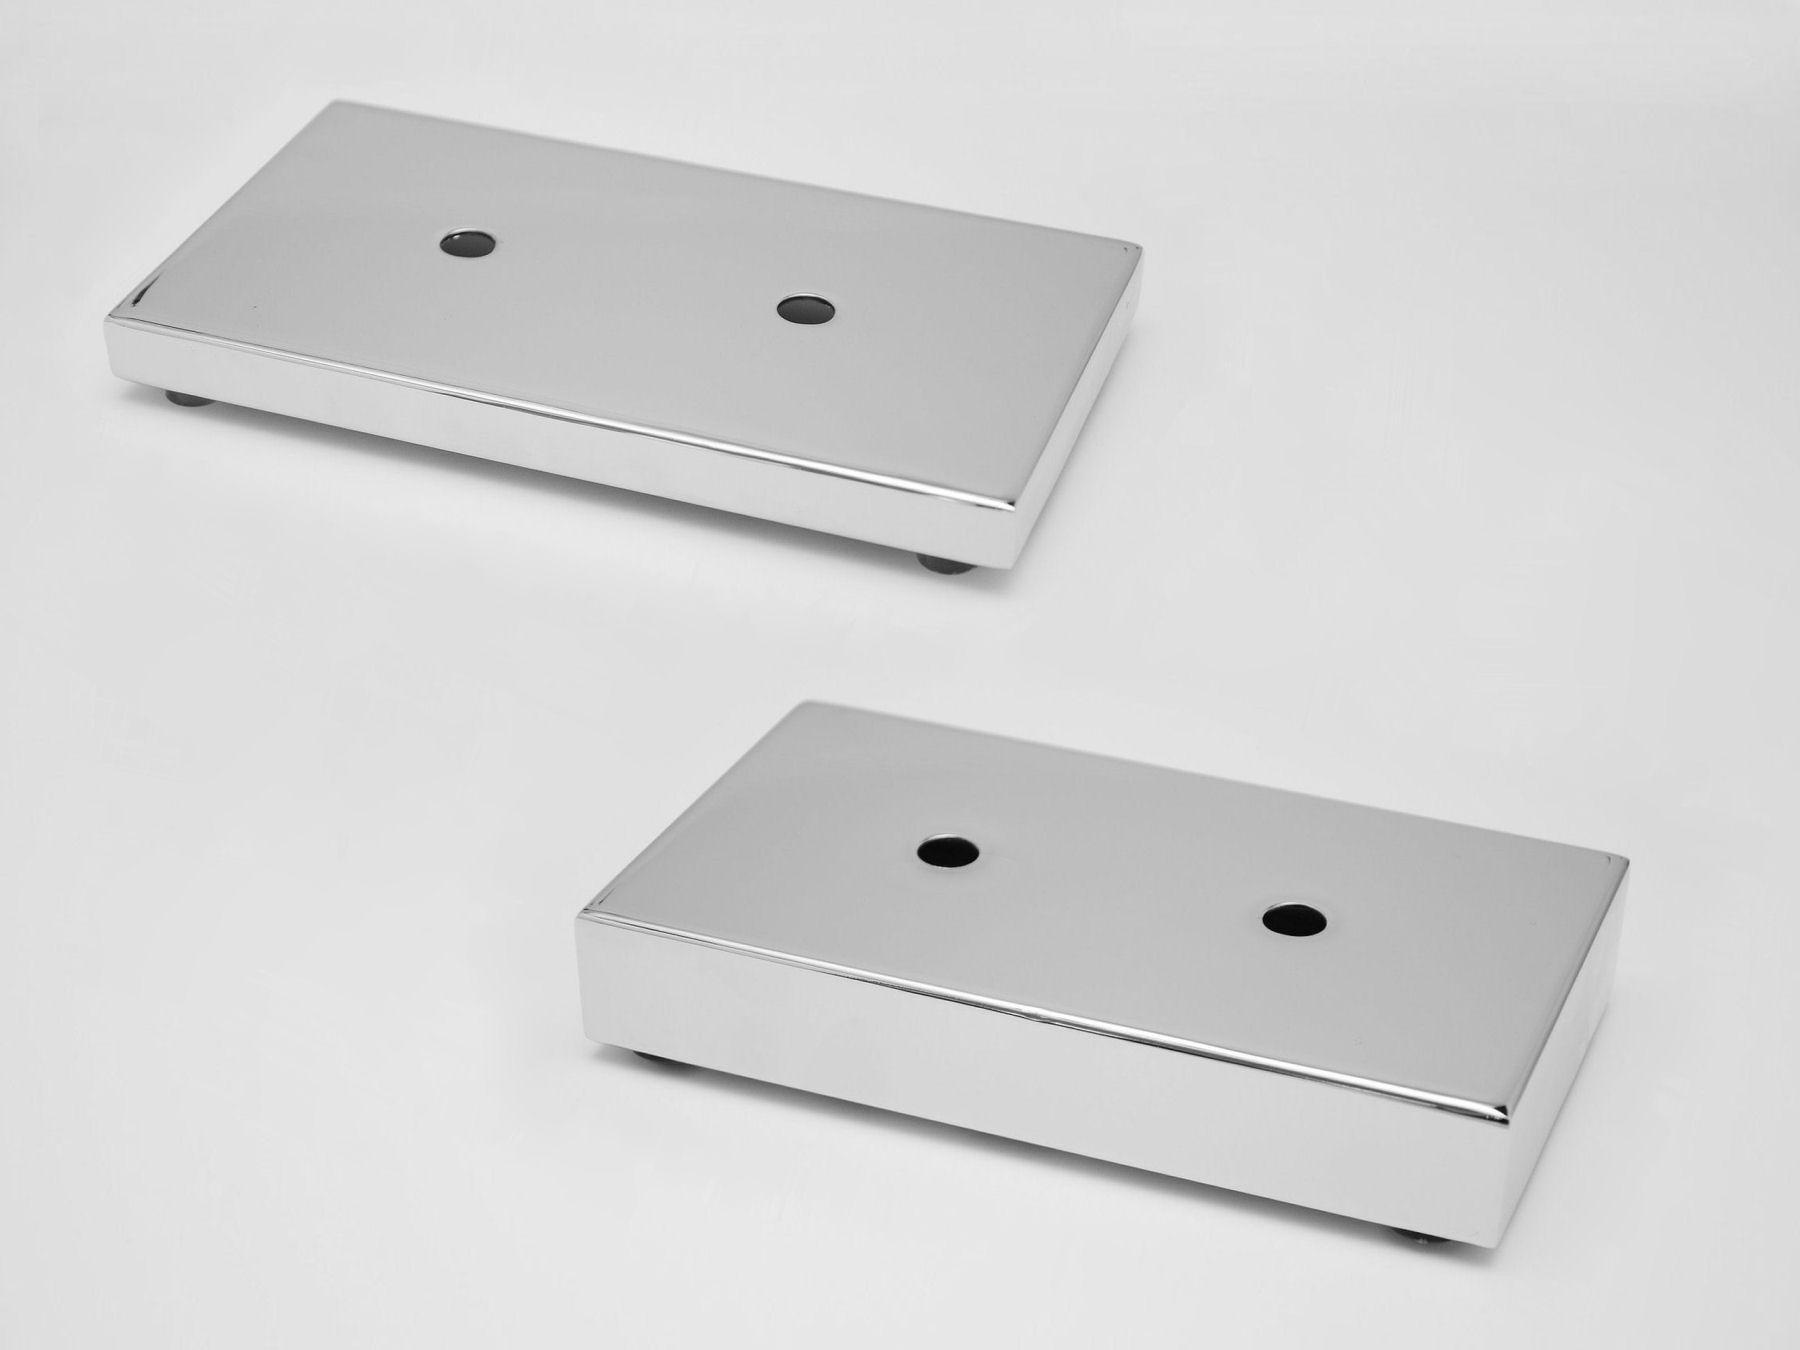 Möbelfüße Metall Eckig.Möbelfuß Möbelfüße Flach Chrom 180 X 100 Mm So Handel De